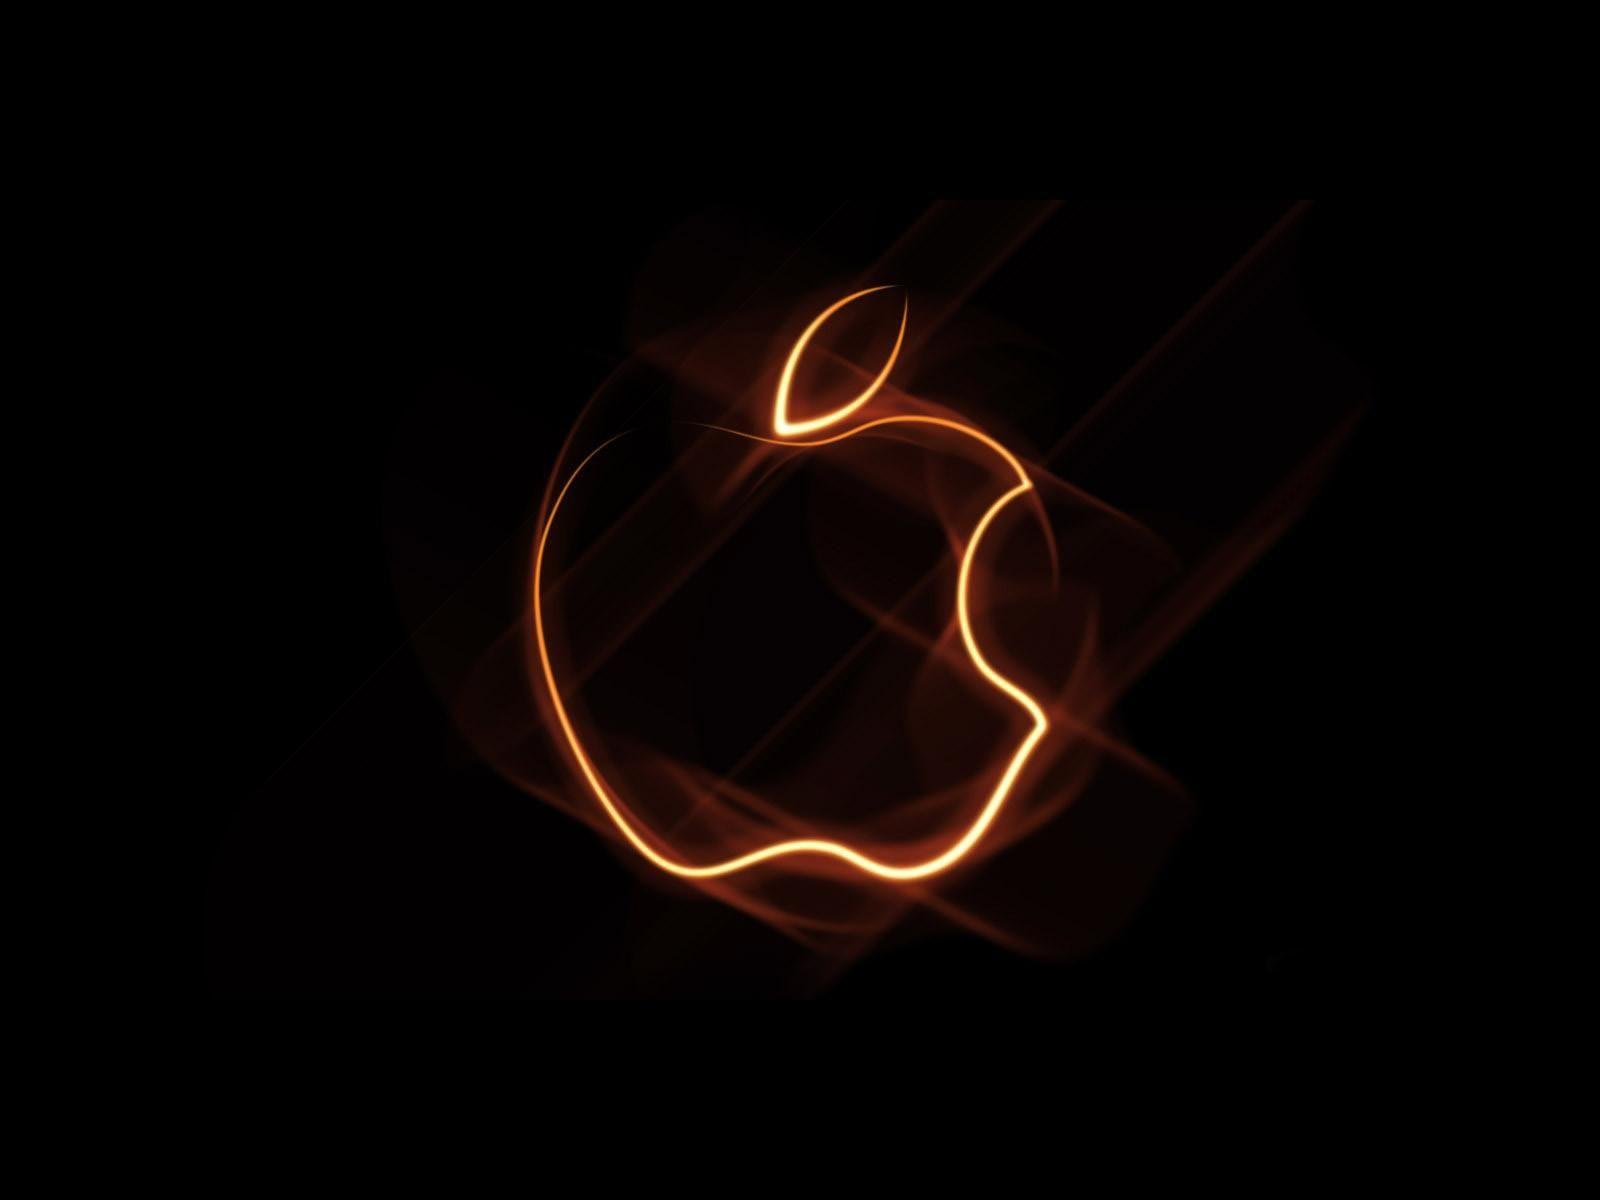 Fire apple logo vector designs wallpaper pinterest apple fire apple logo buycottarizona